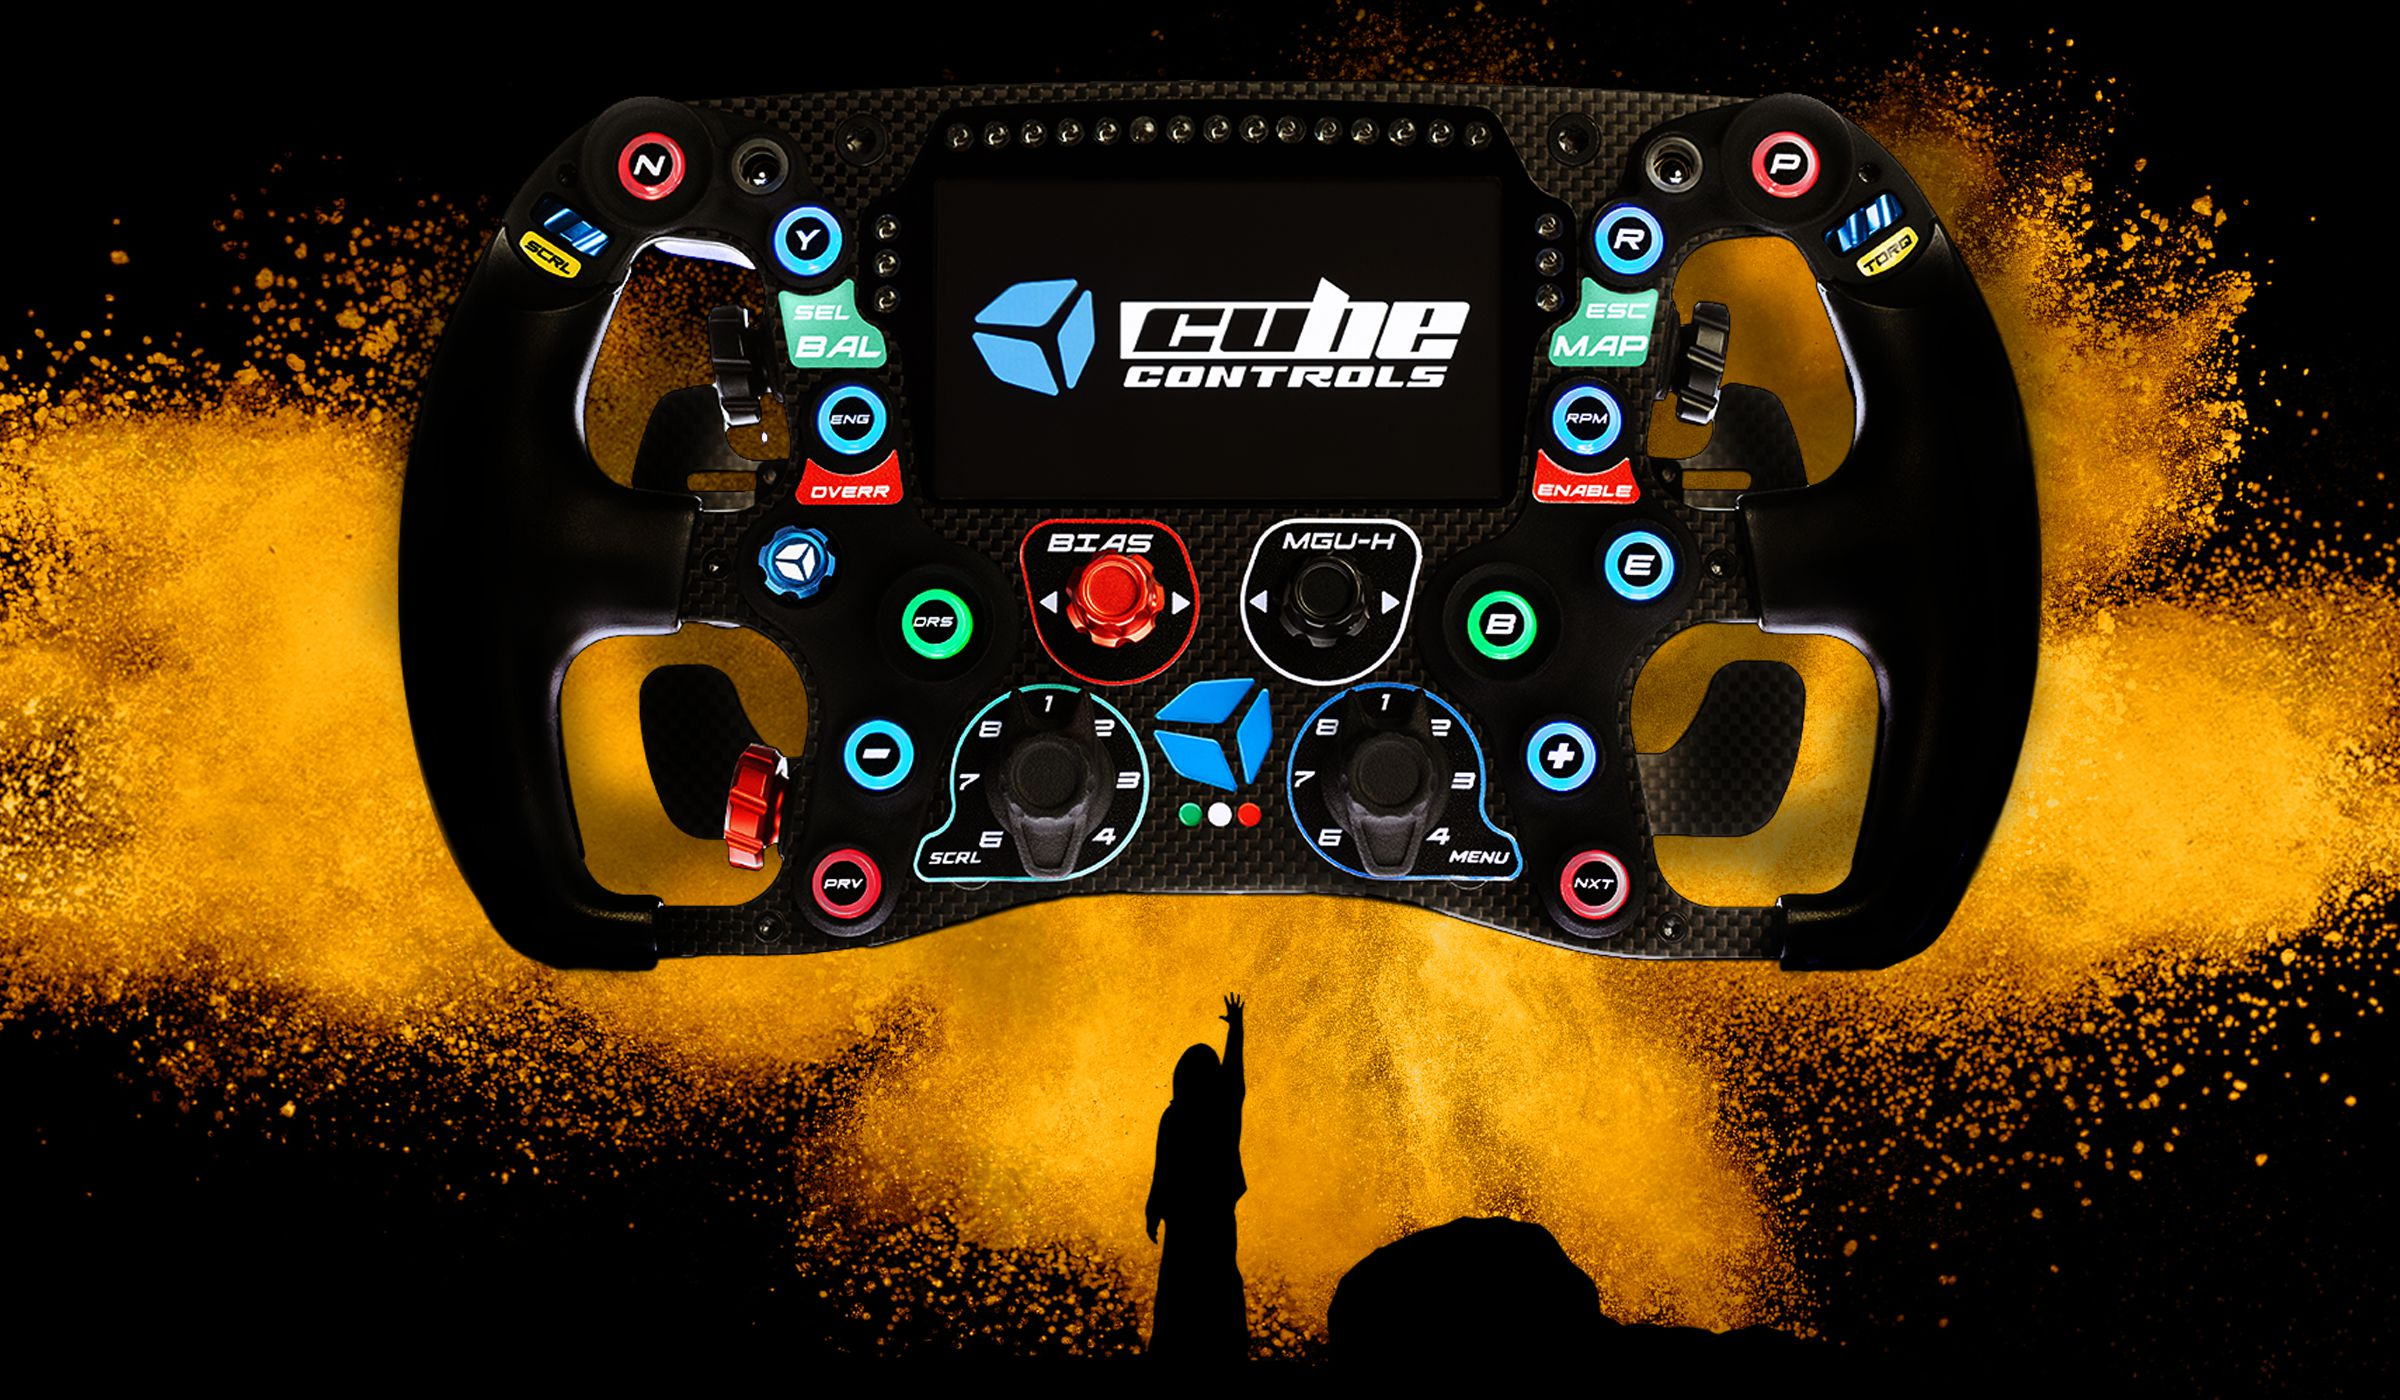 shop.gperformance.eu - Cube Controls Formula CSX 2 carbon fiber PC USB sim racing wheel Fanatec Logitech Thurstmaster Accuforce SimuCube 2 - G-Performance